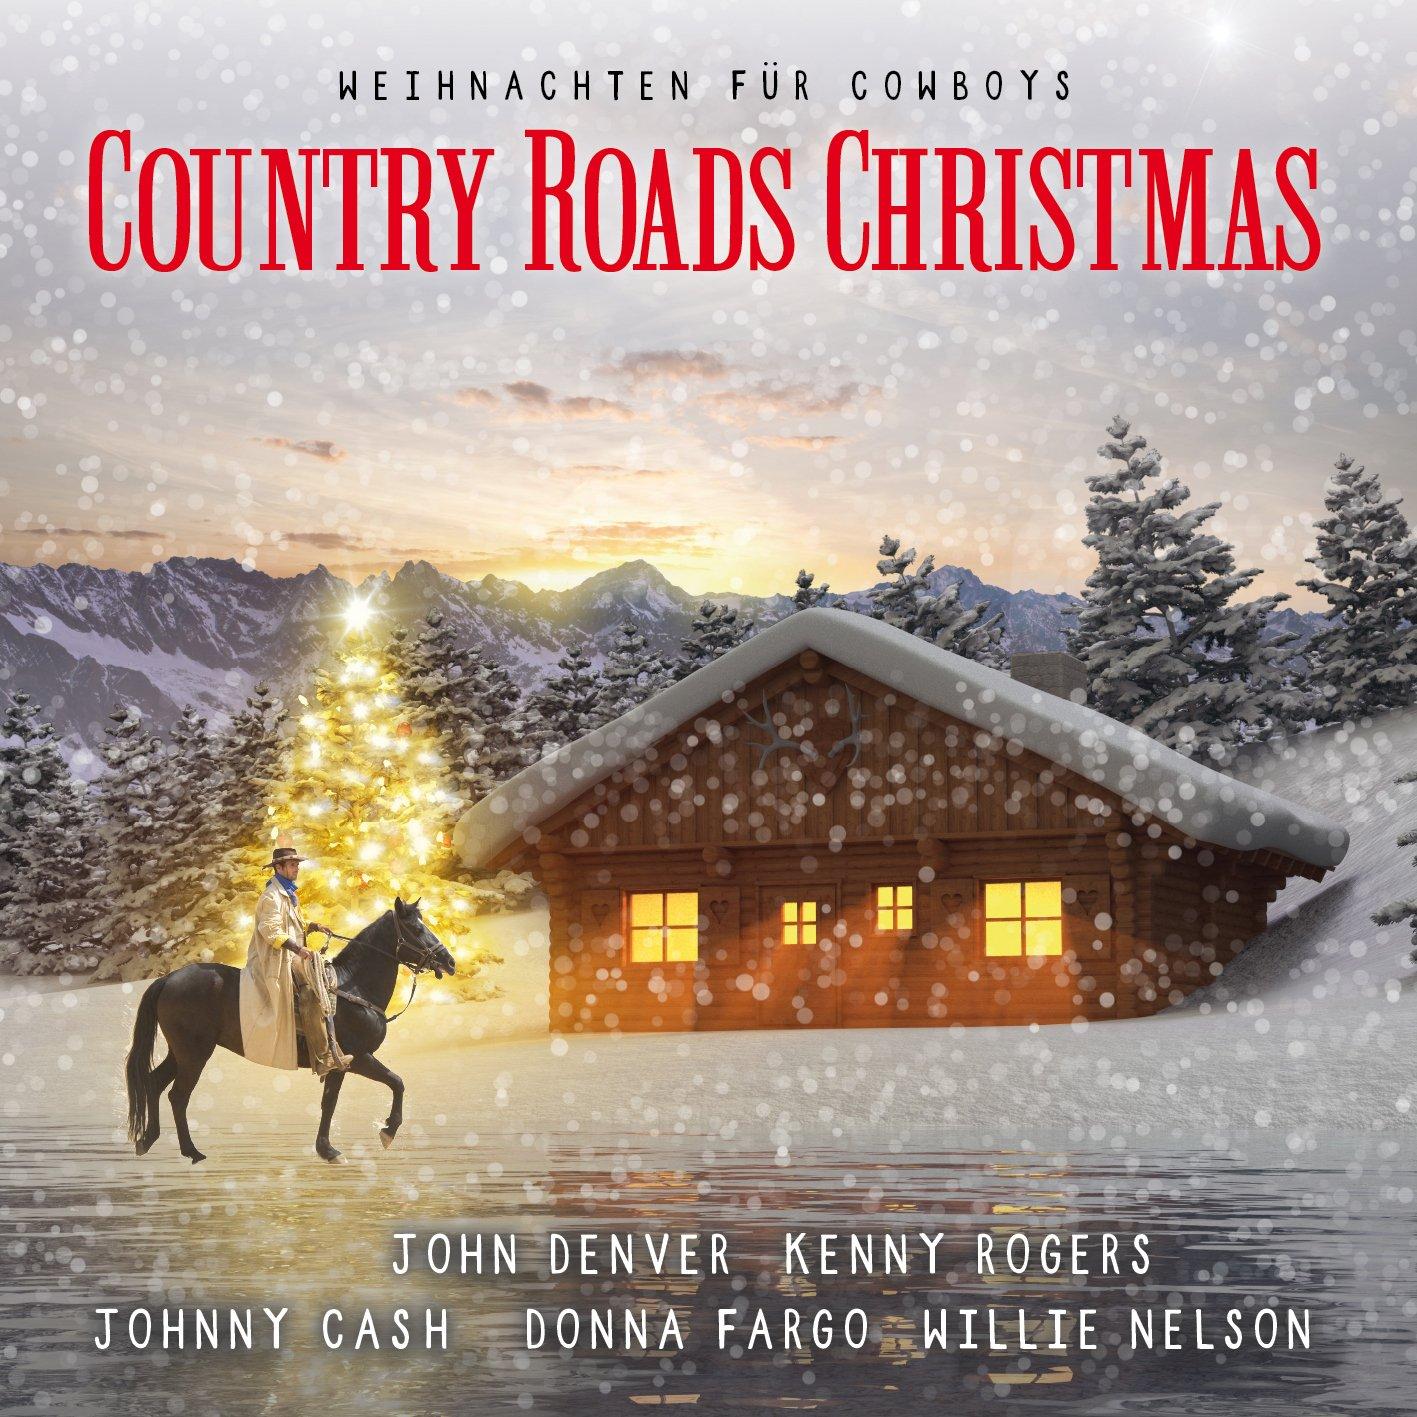 Country Roads Christmas - John Denver, Johnny Cash: Amazon.de: Musik